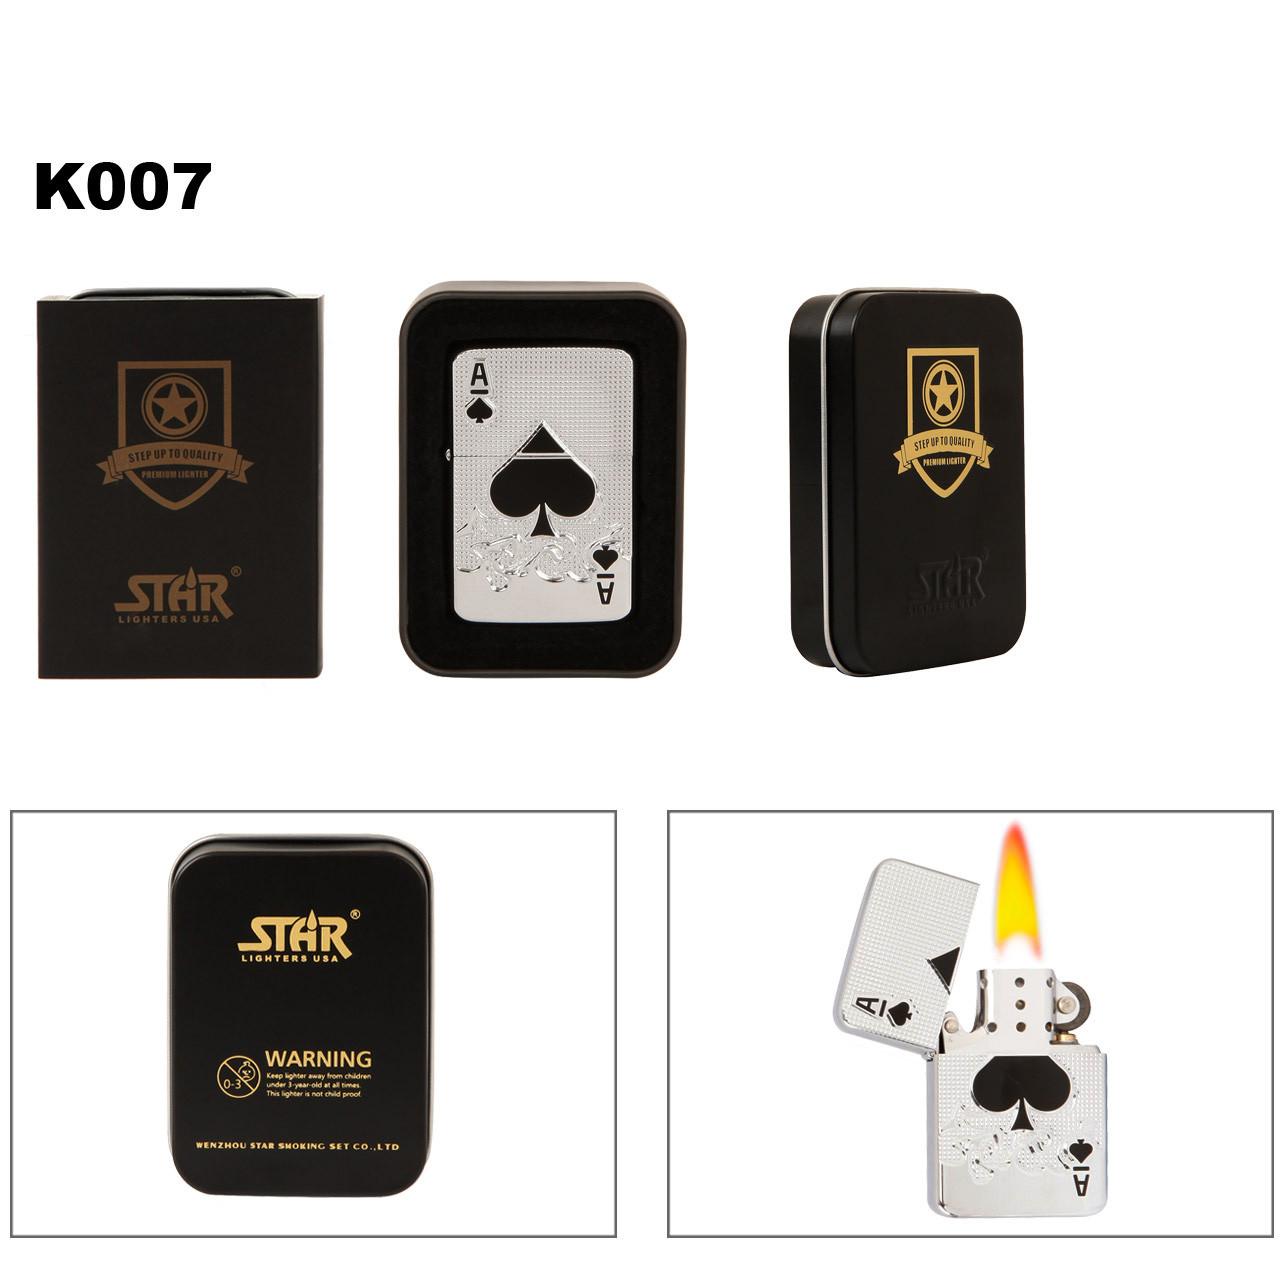 Ace of Spade Brass Lighter K007